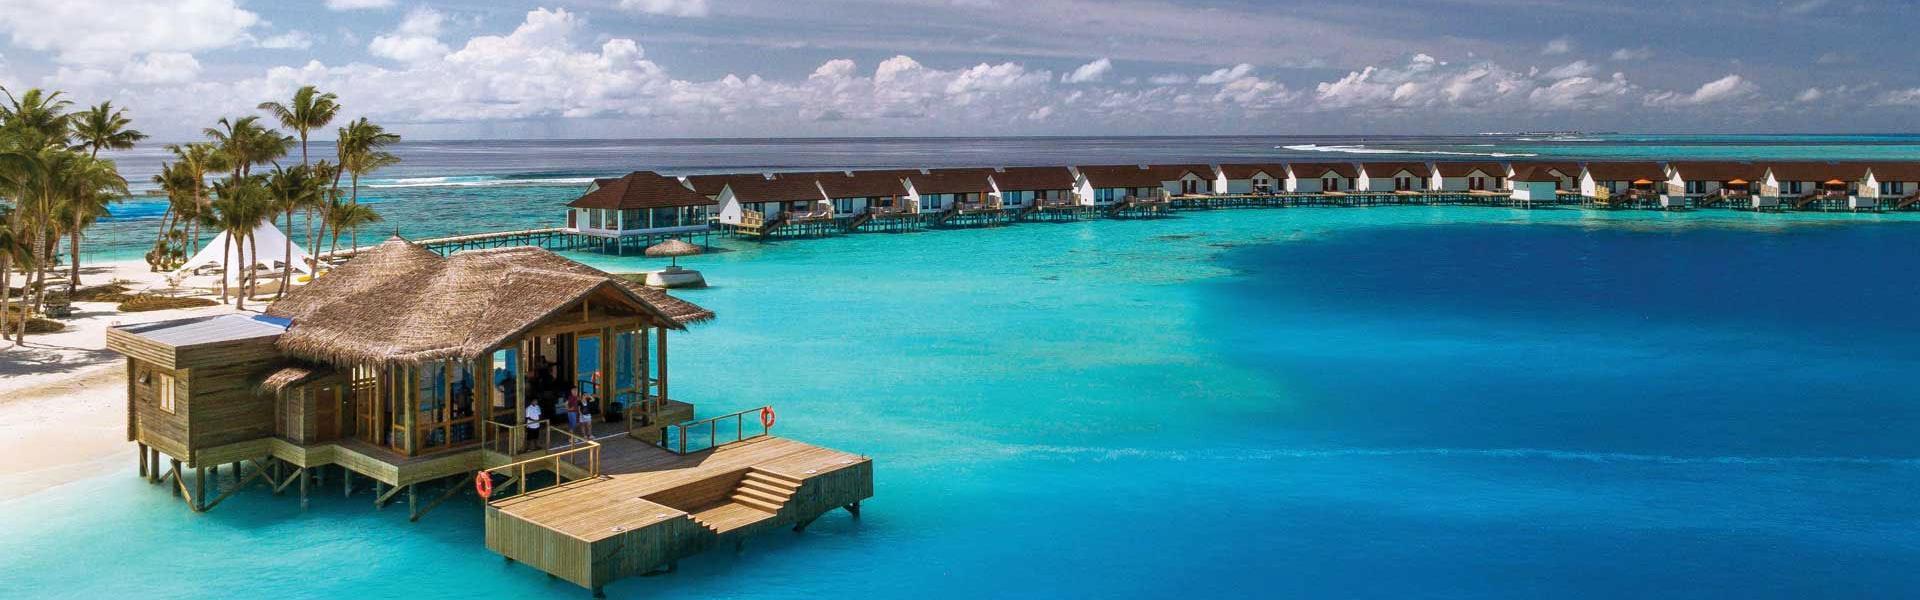 OBLU SELECT at Sangeli by Atmosphere (Maldív-szigeteki utazások)